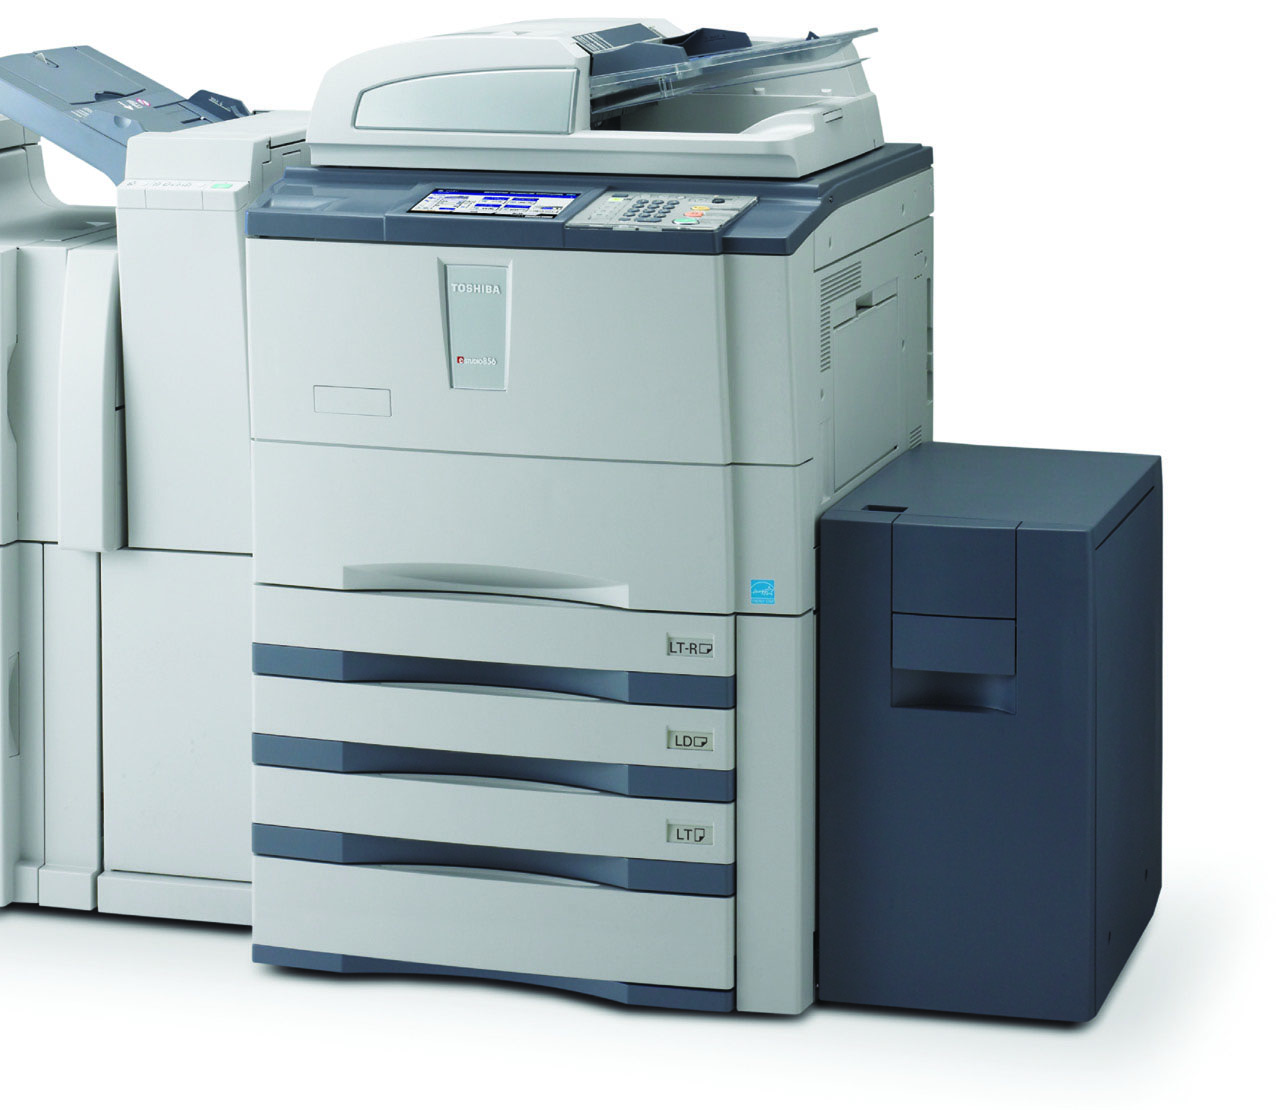 Máy photocopy toshibe e556